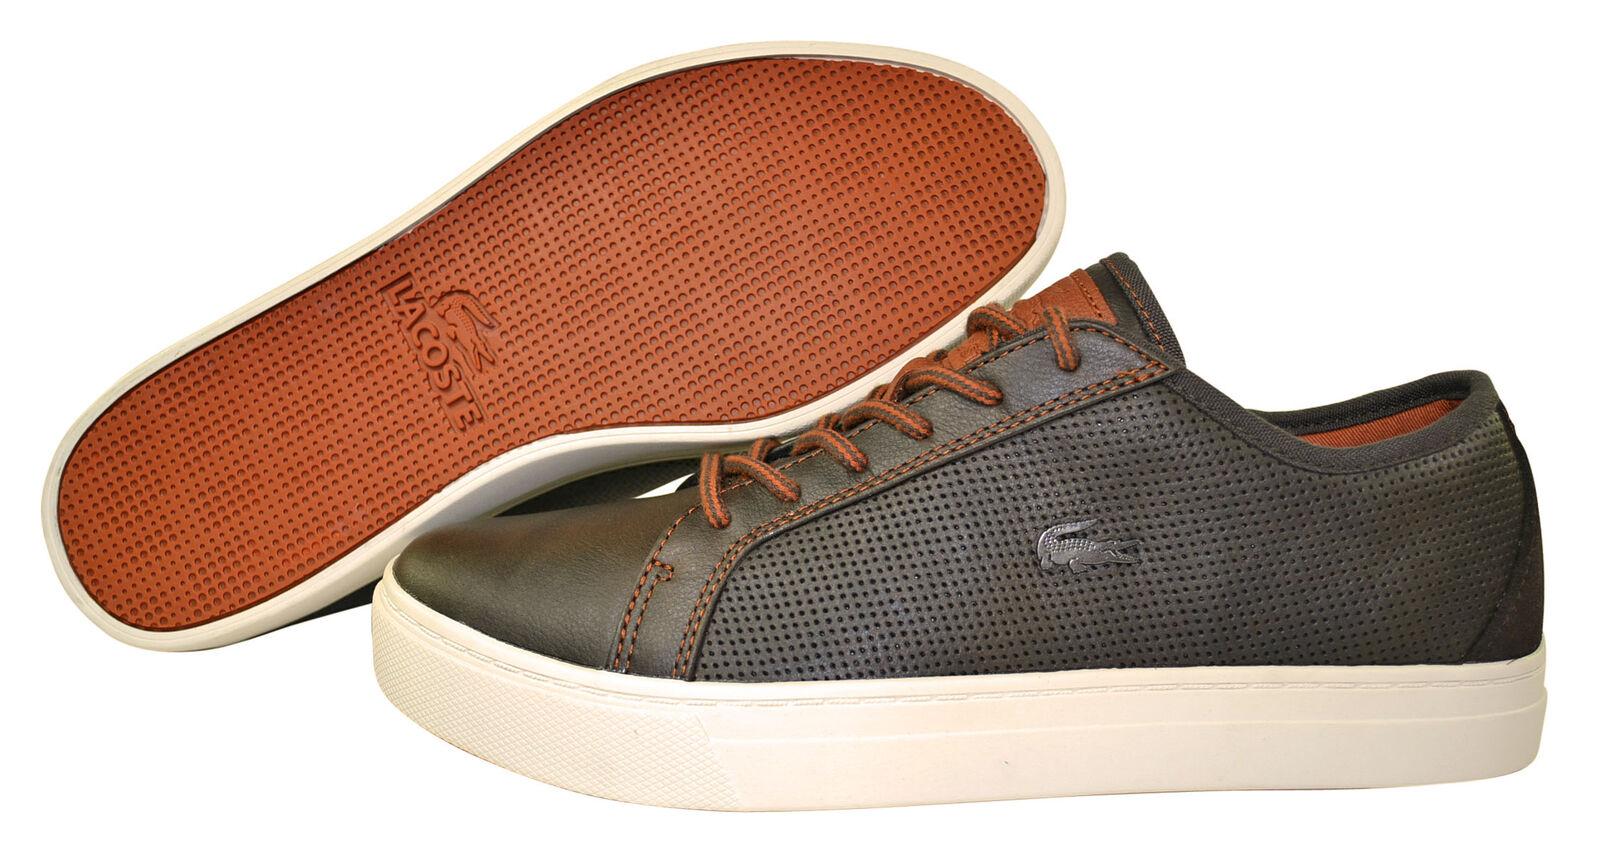 Lacoste Lewiston AP SRM dk brown Schuhe/Sneaker Größenauswahl